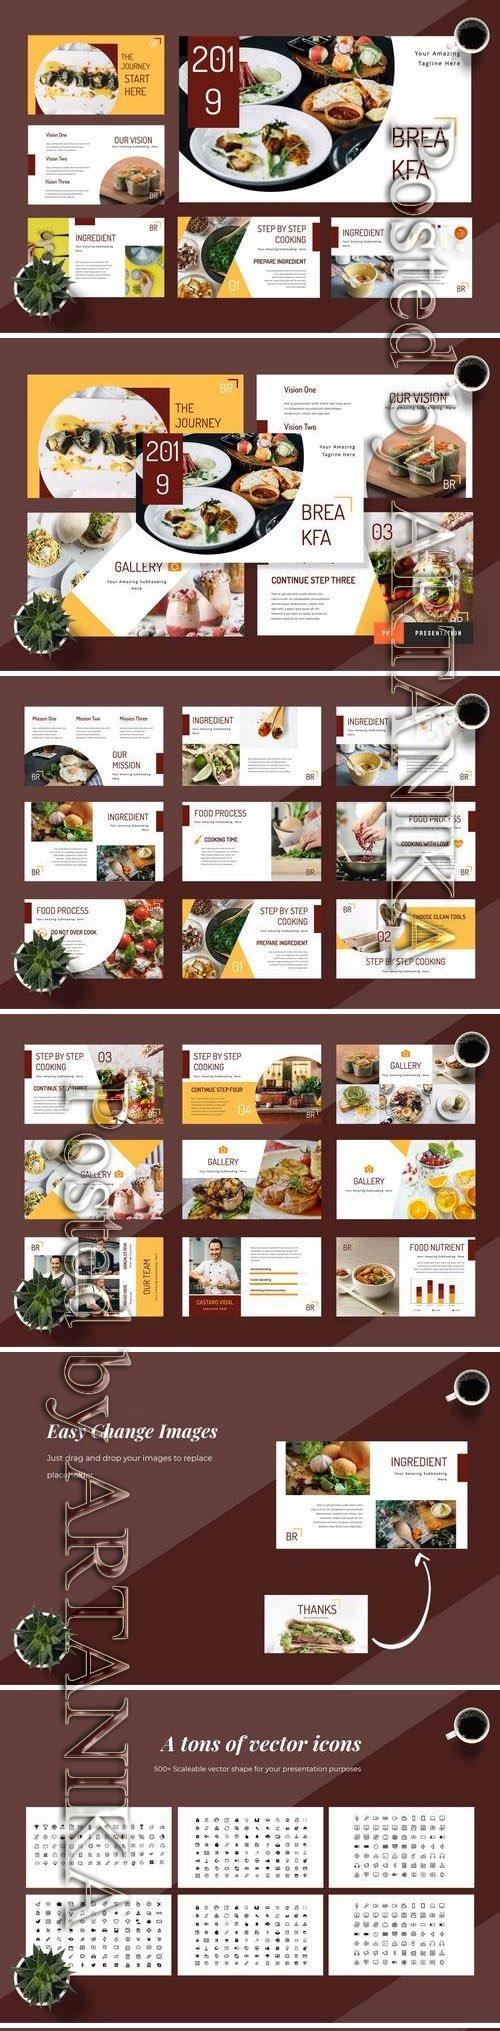 Breakfa - Food Powerpoint, Keynote, Google Sliders Templates